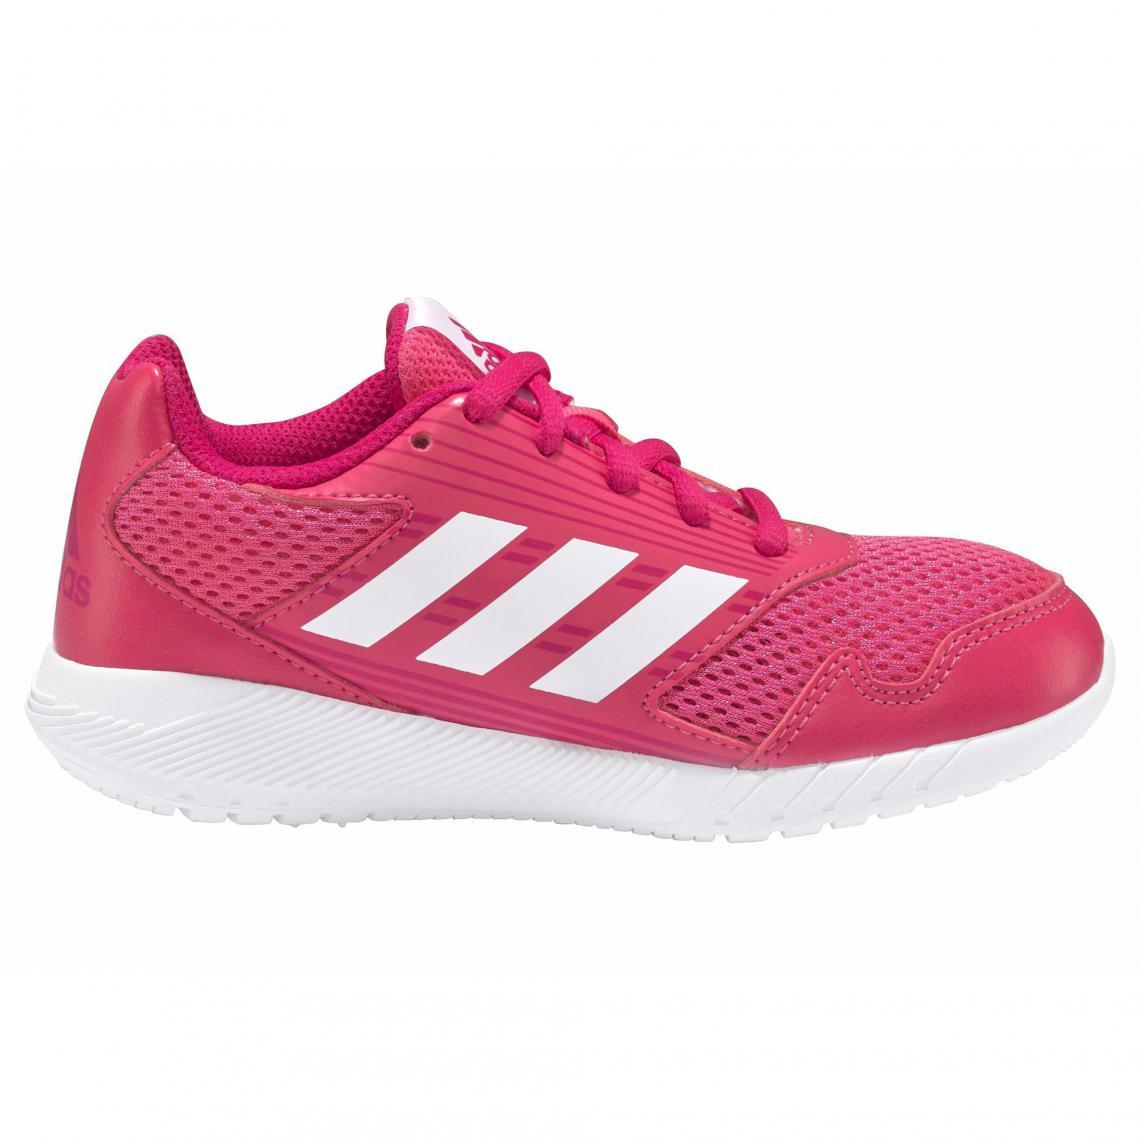 Sneakers Altarun Blanc Vif Rose Performance Basses Adidas Fille qWEp78f6Ww aa4c046ae93